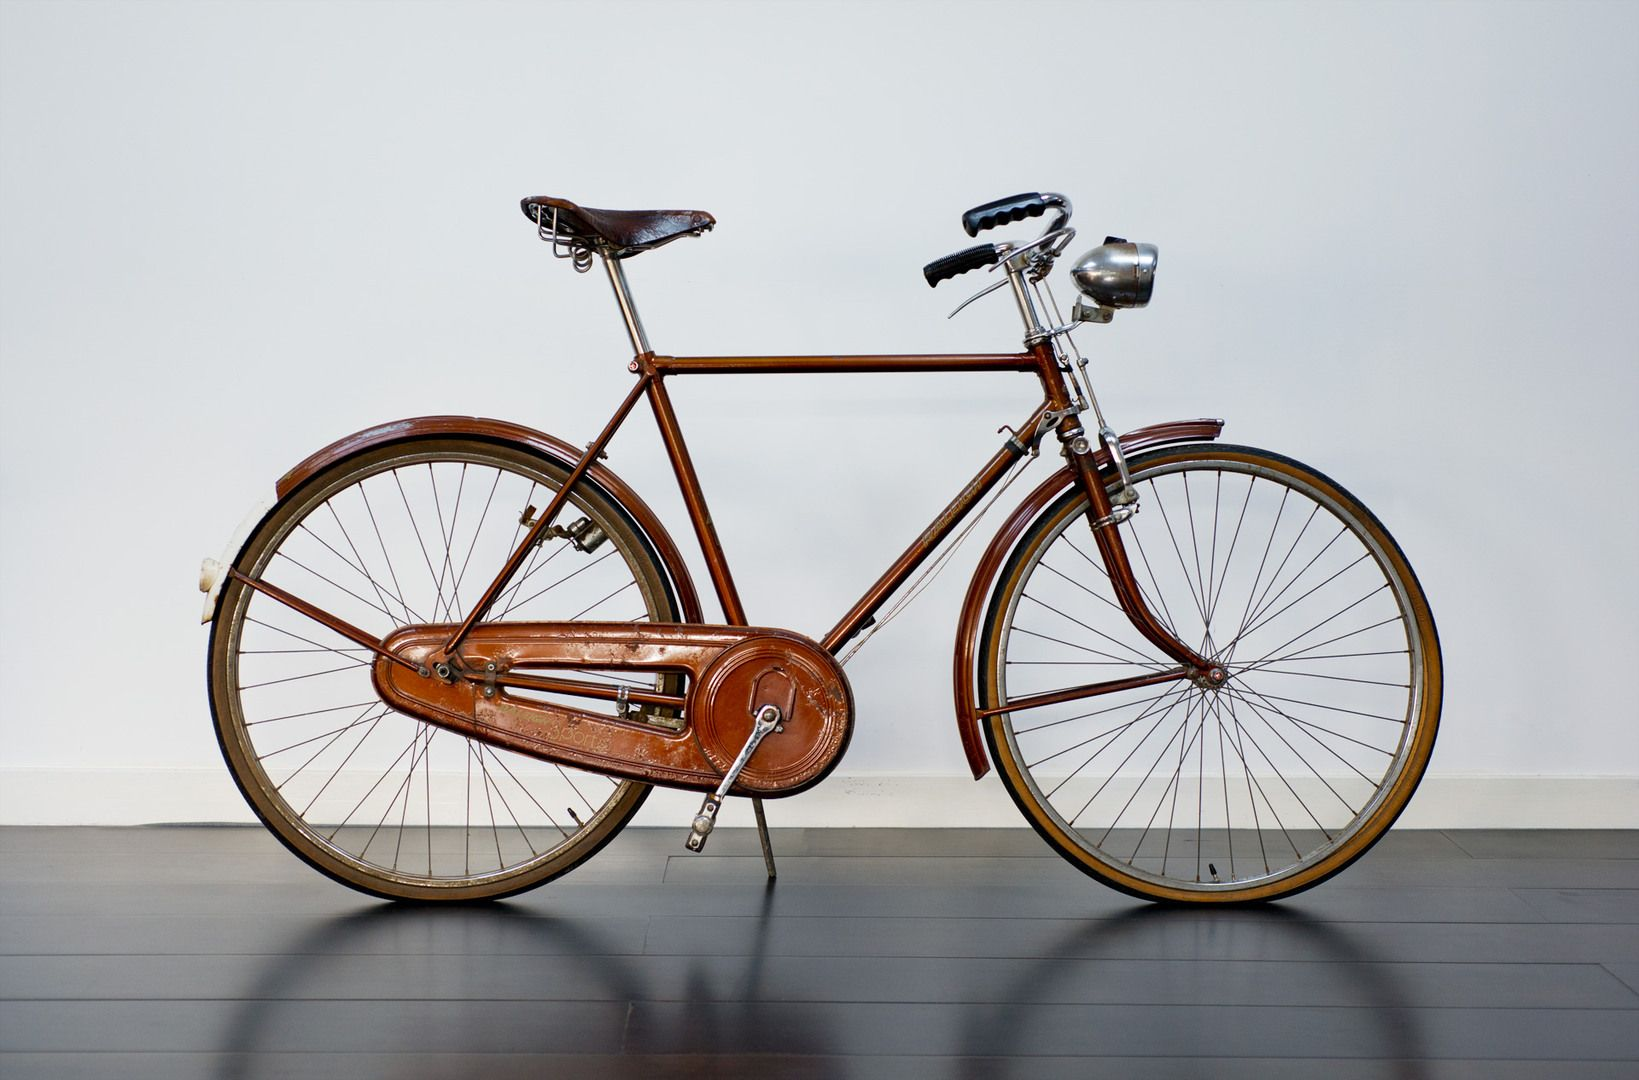 vintage raleigh bike google search bike stuff. Black Bedroom Furniture Sets. Home Design Ideas